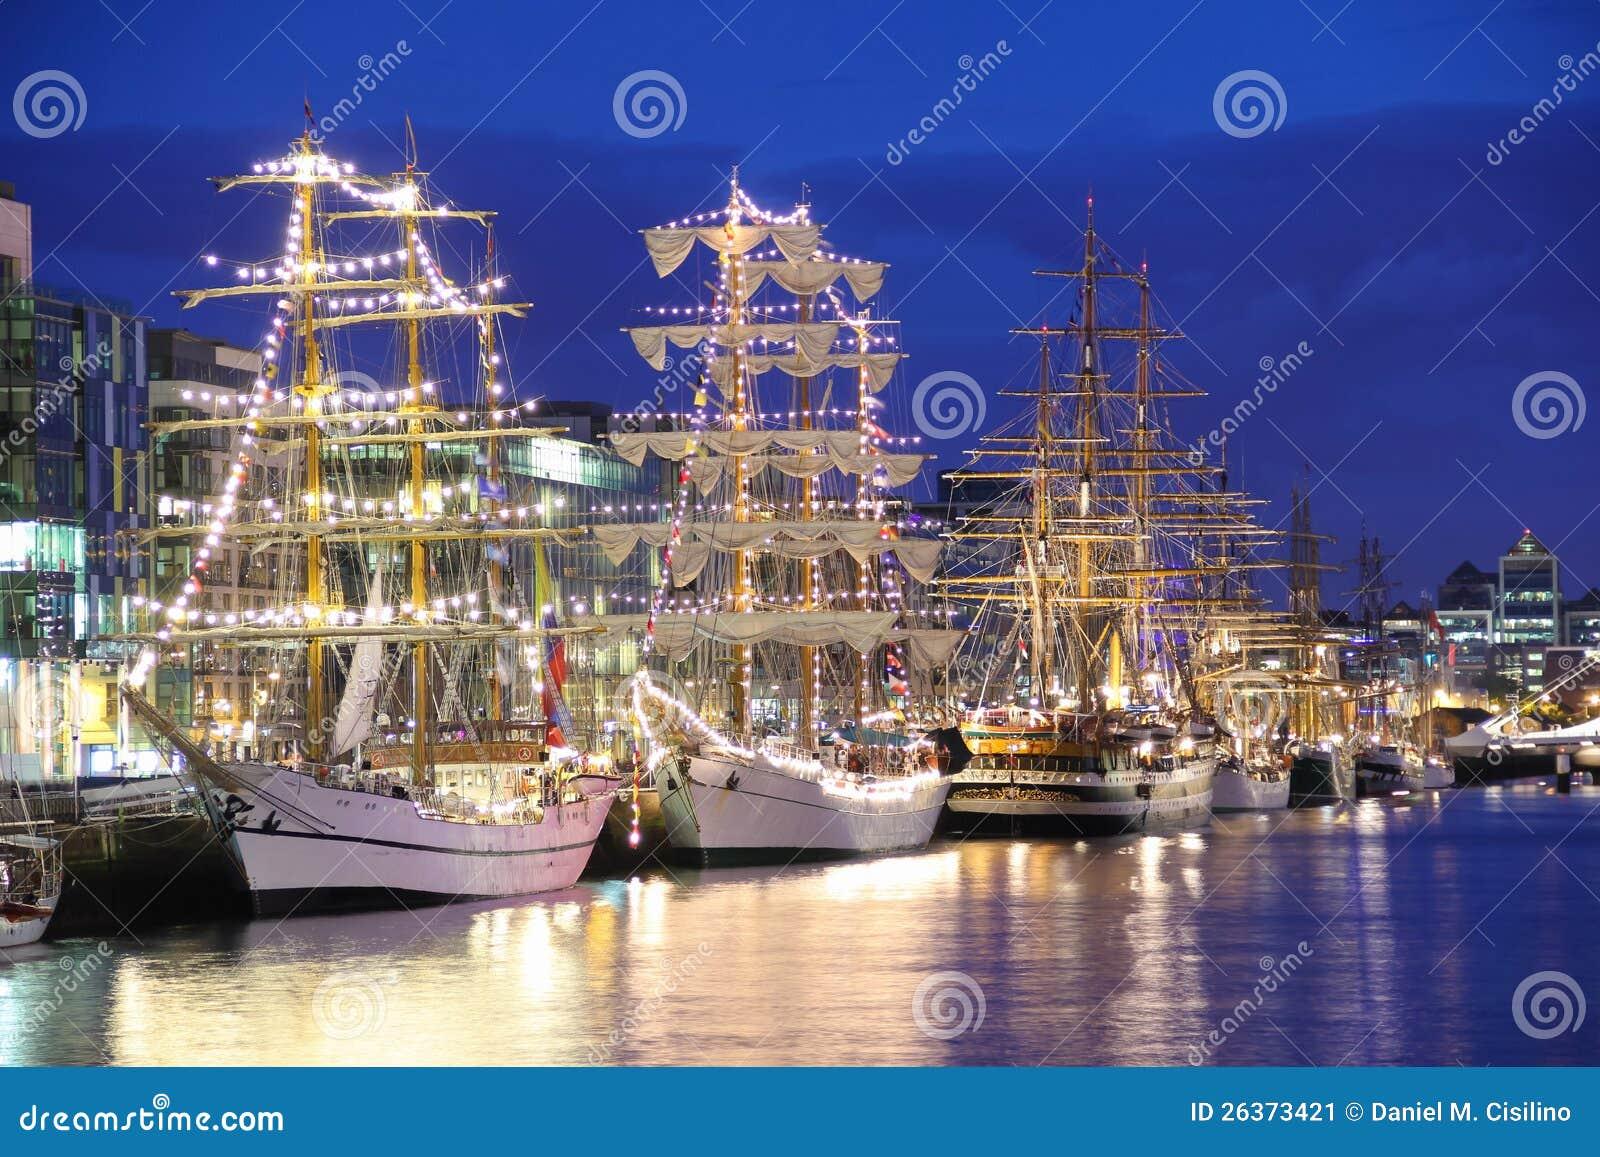 Tall Ships moored at the Liffey, Dublin